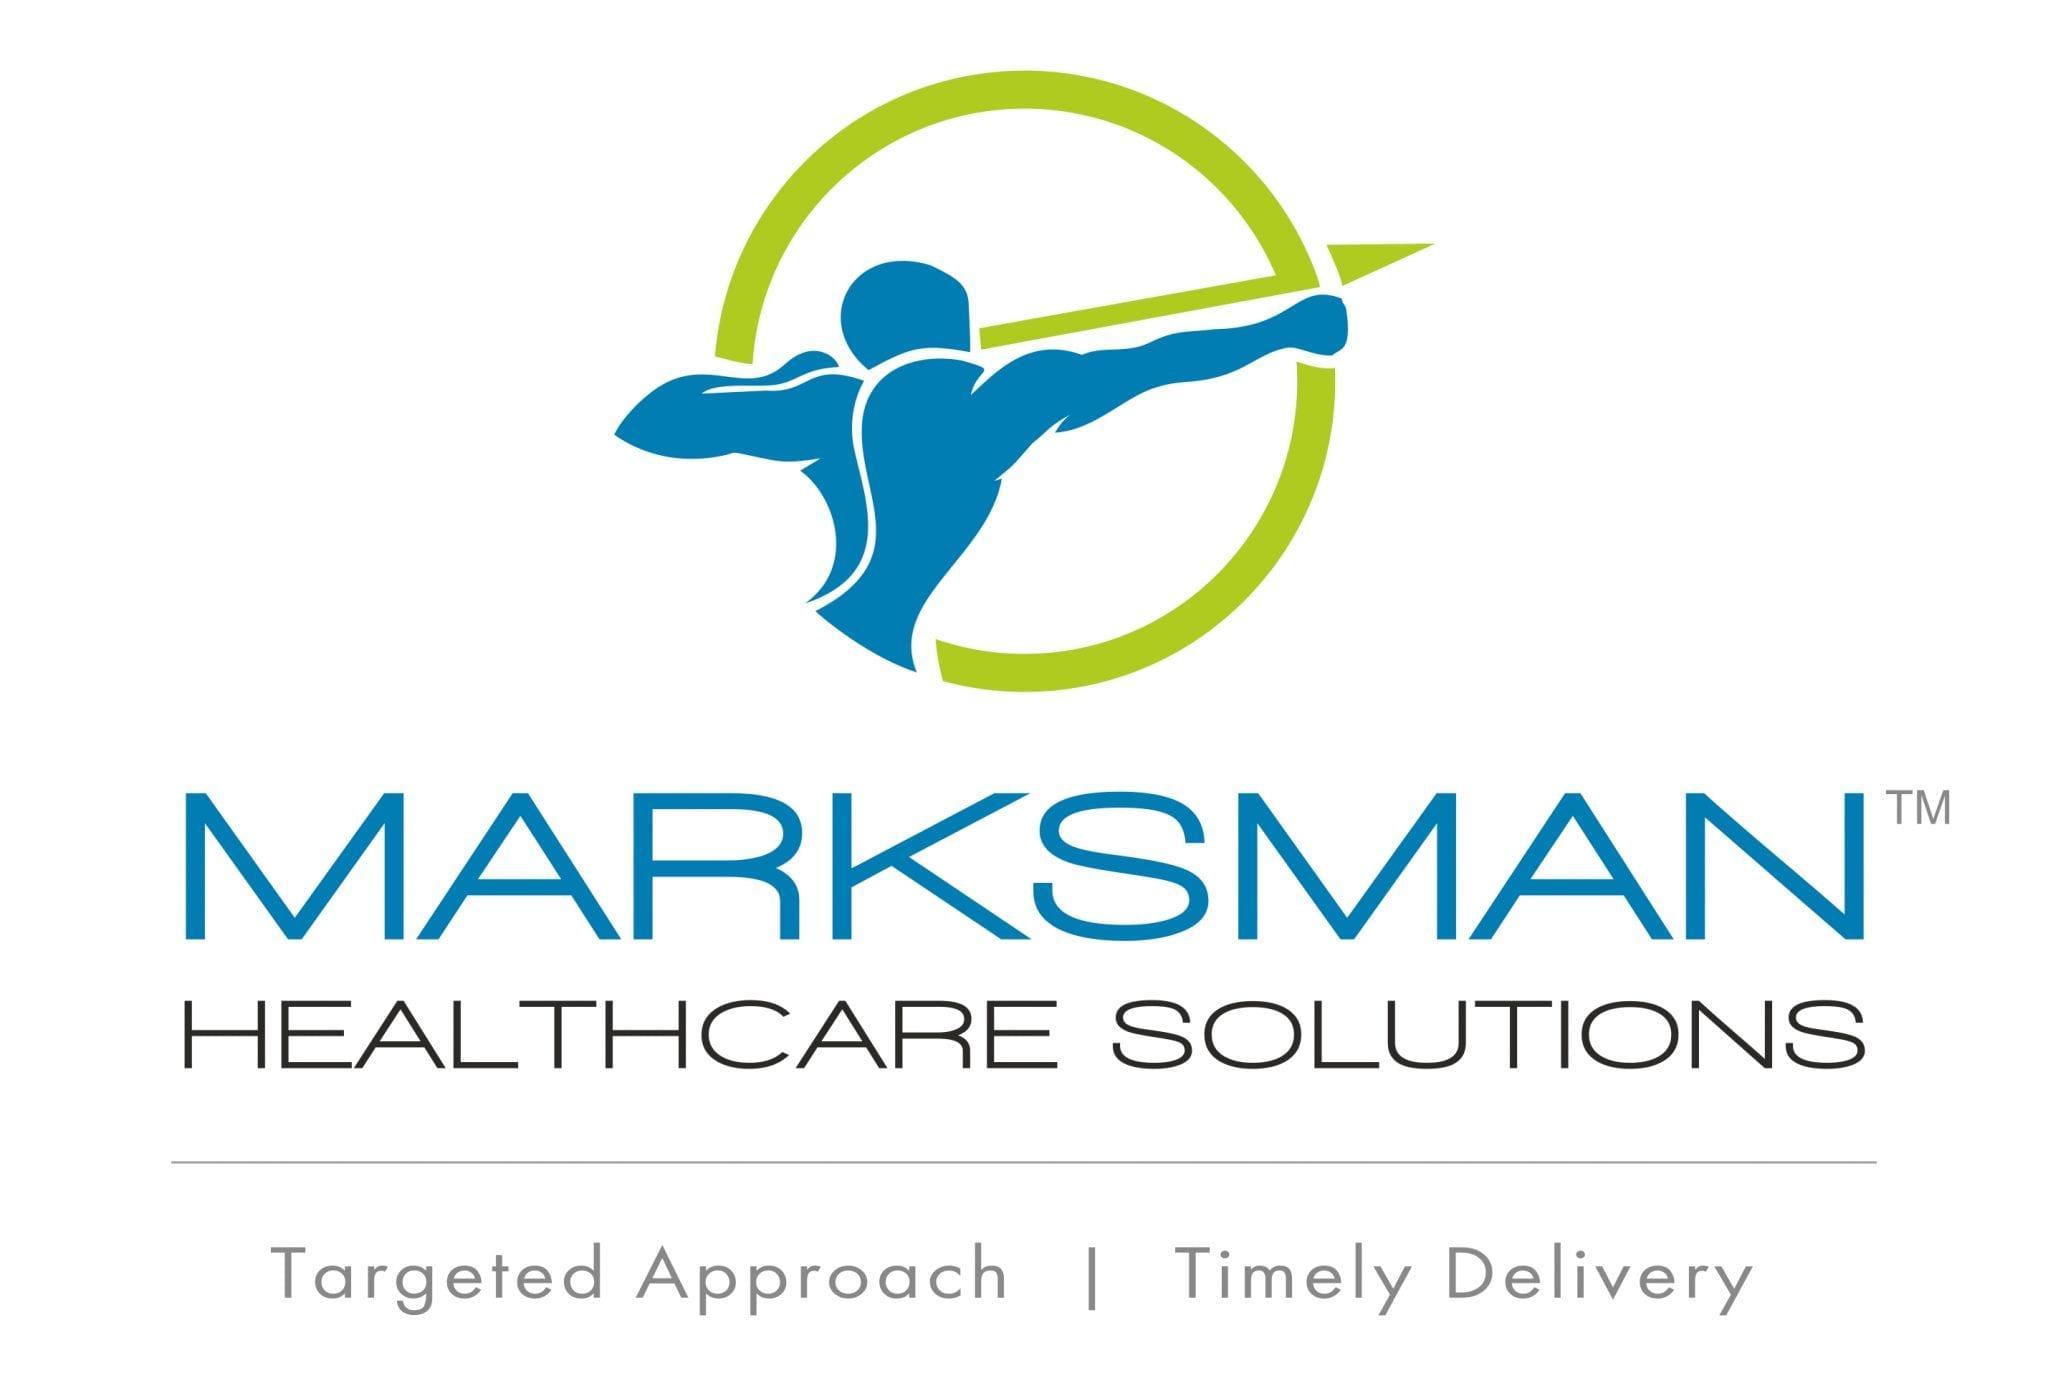 Marskman logo with TM